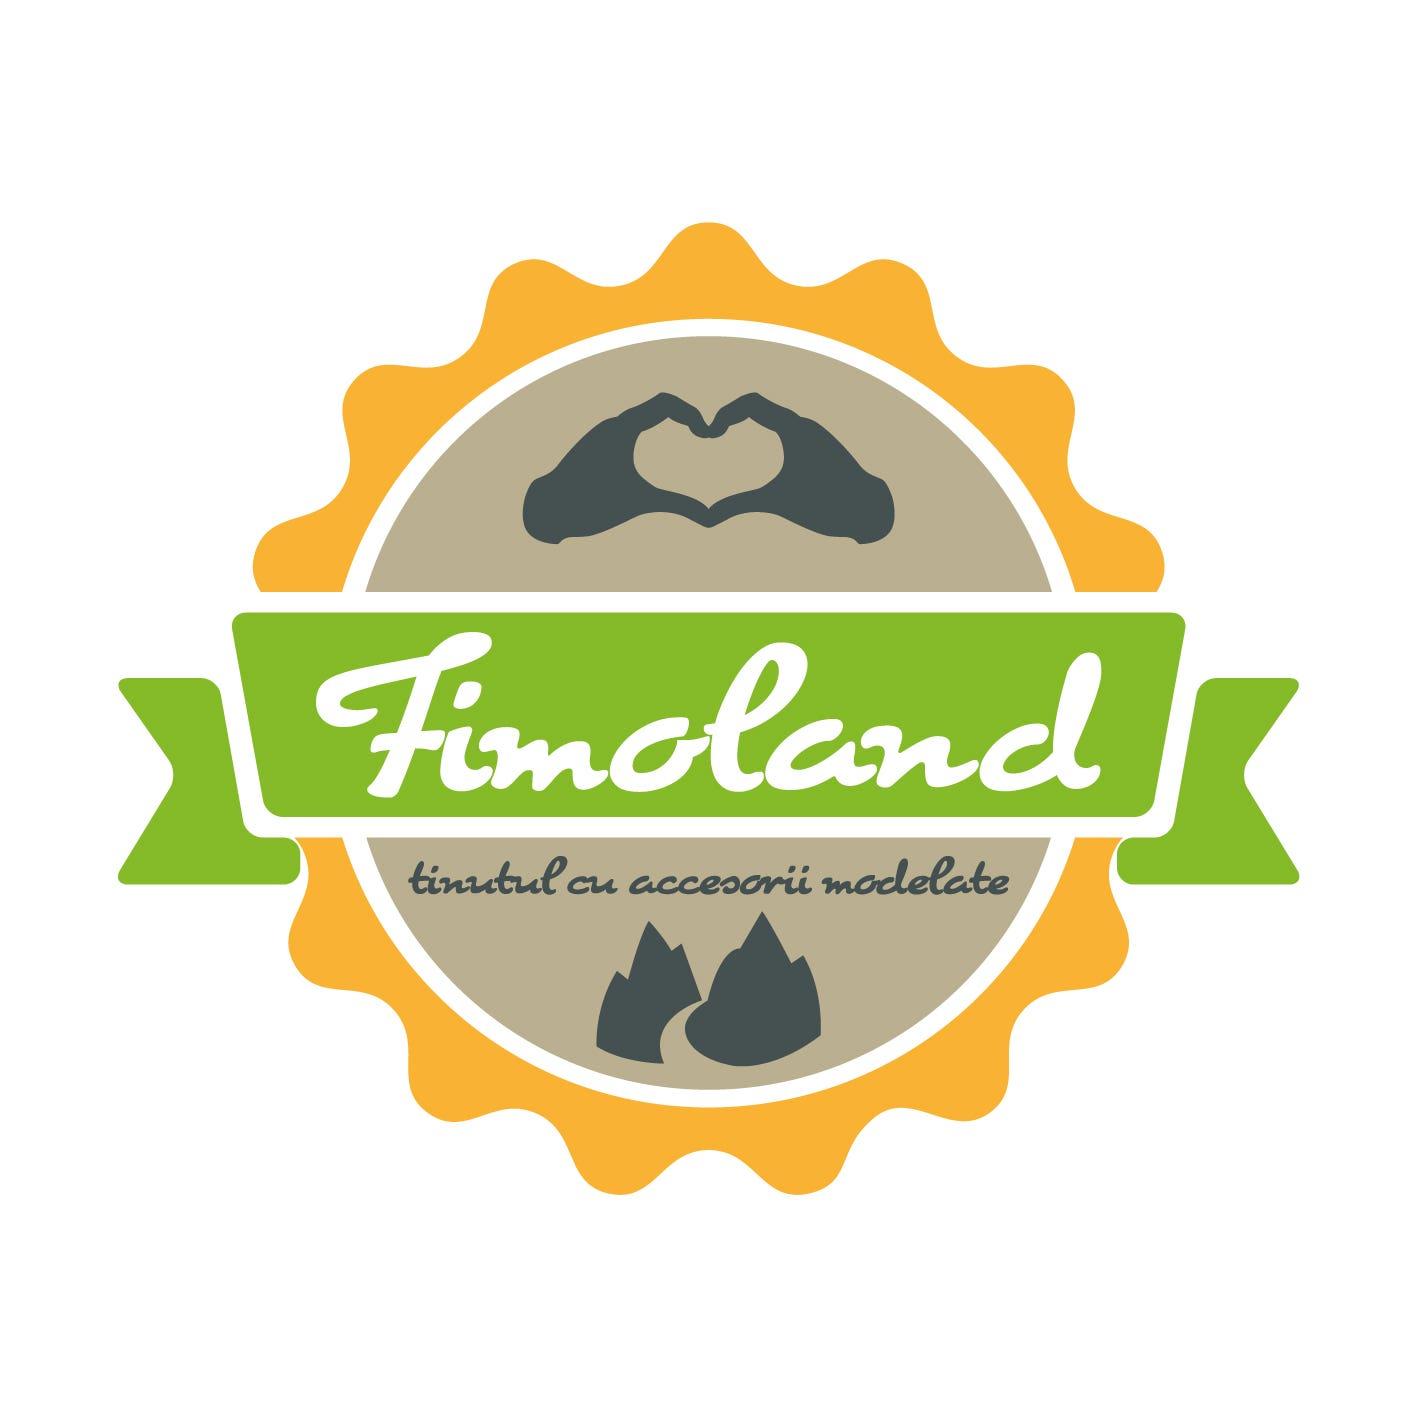 Fimoland